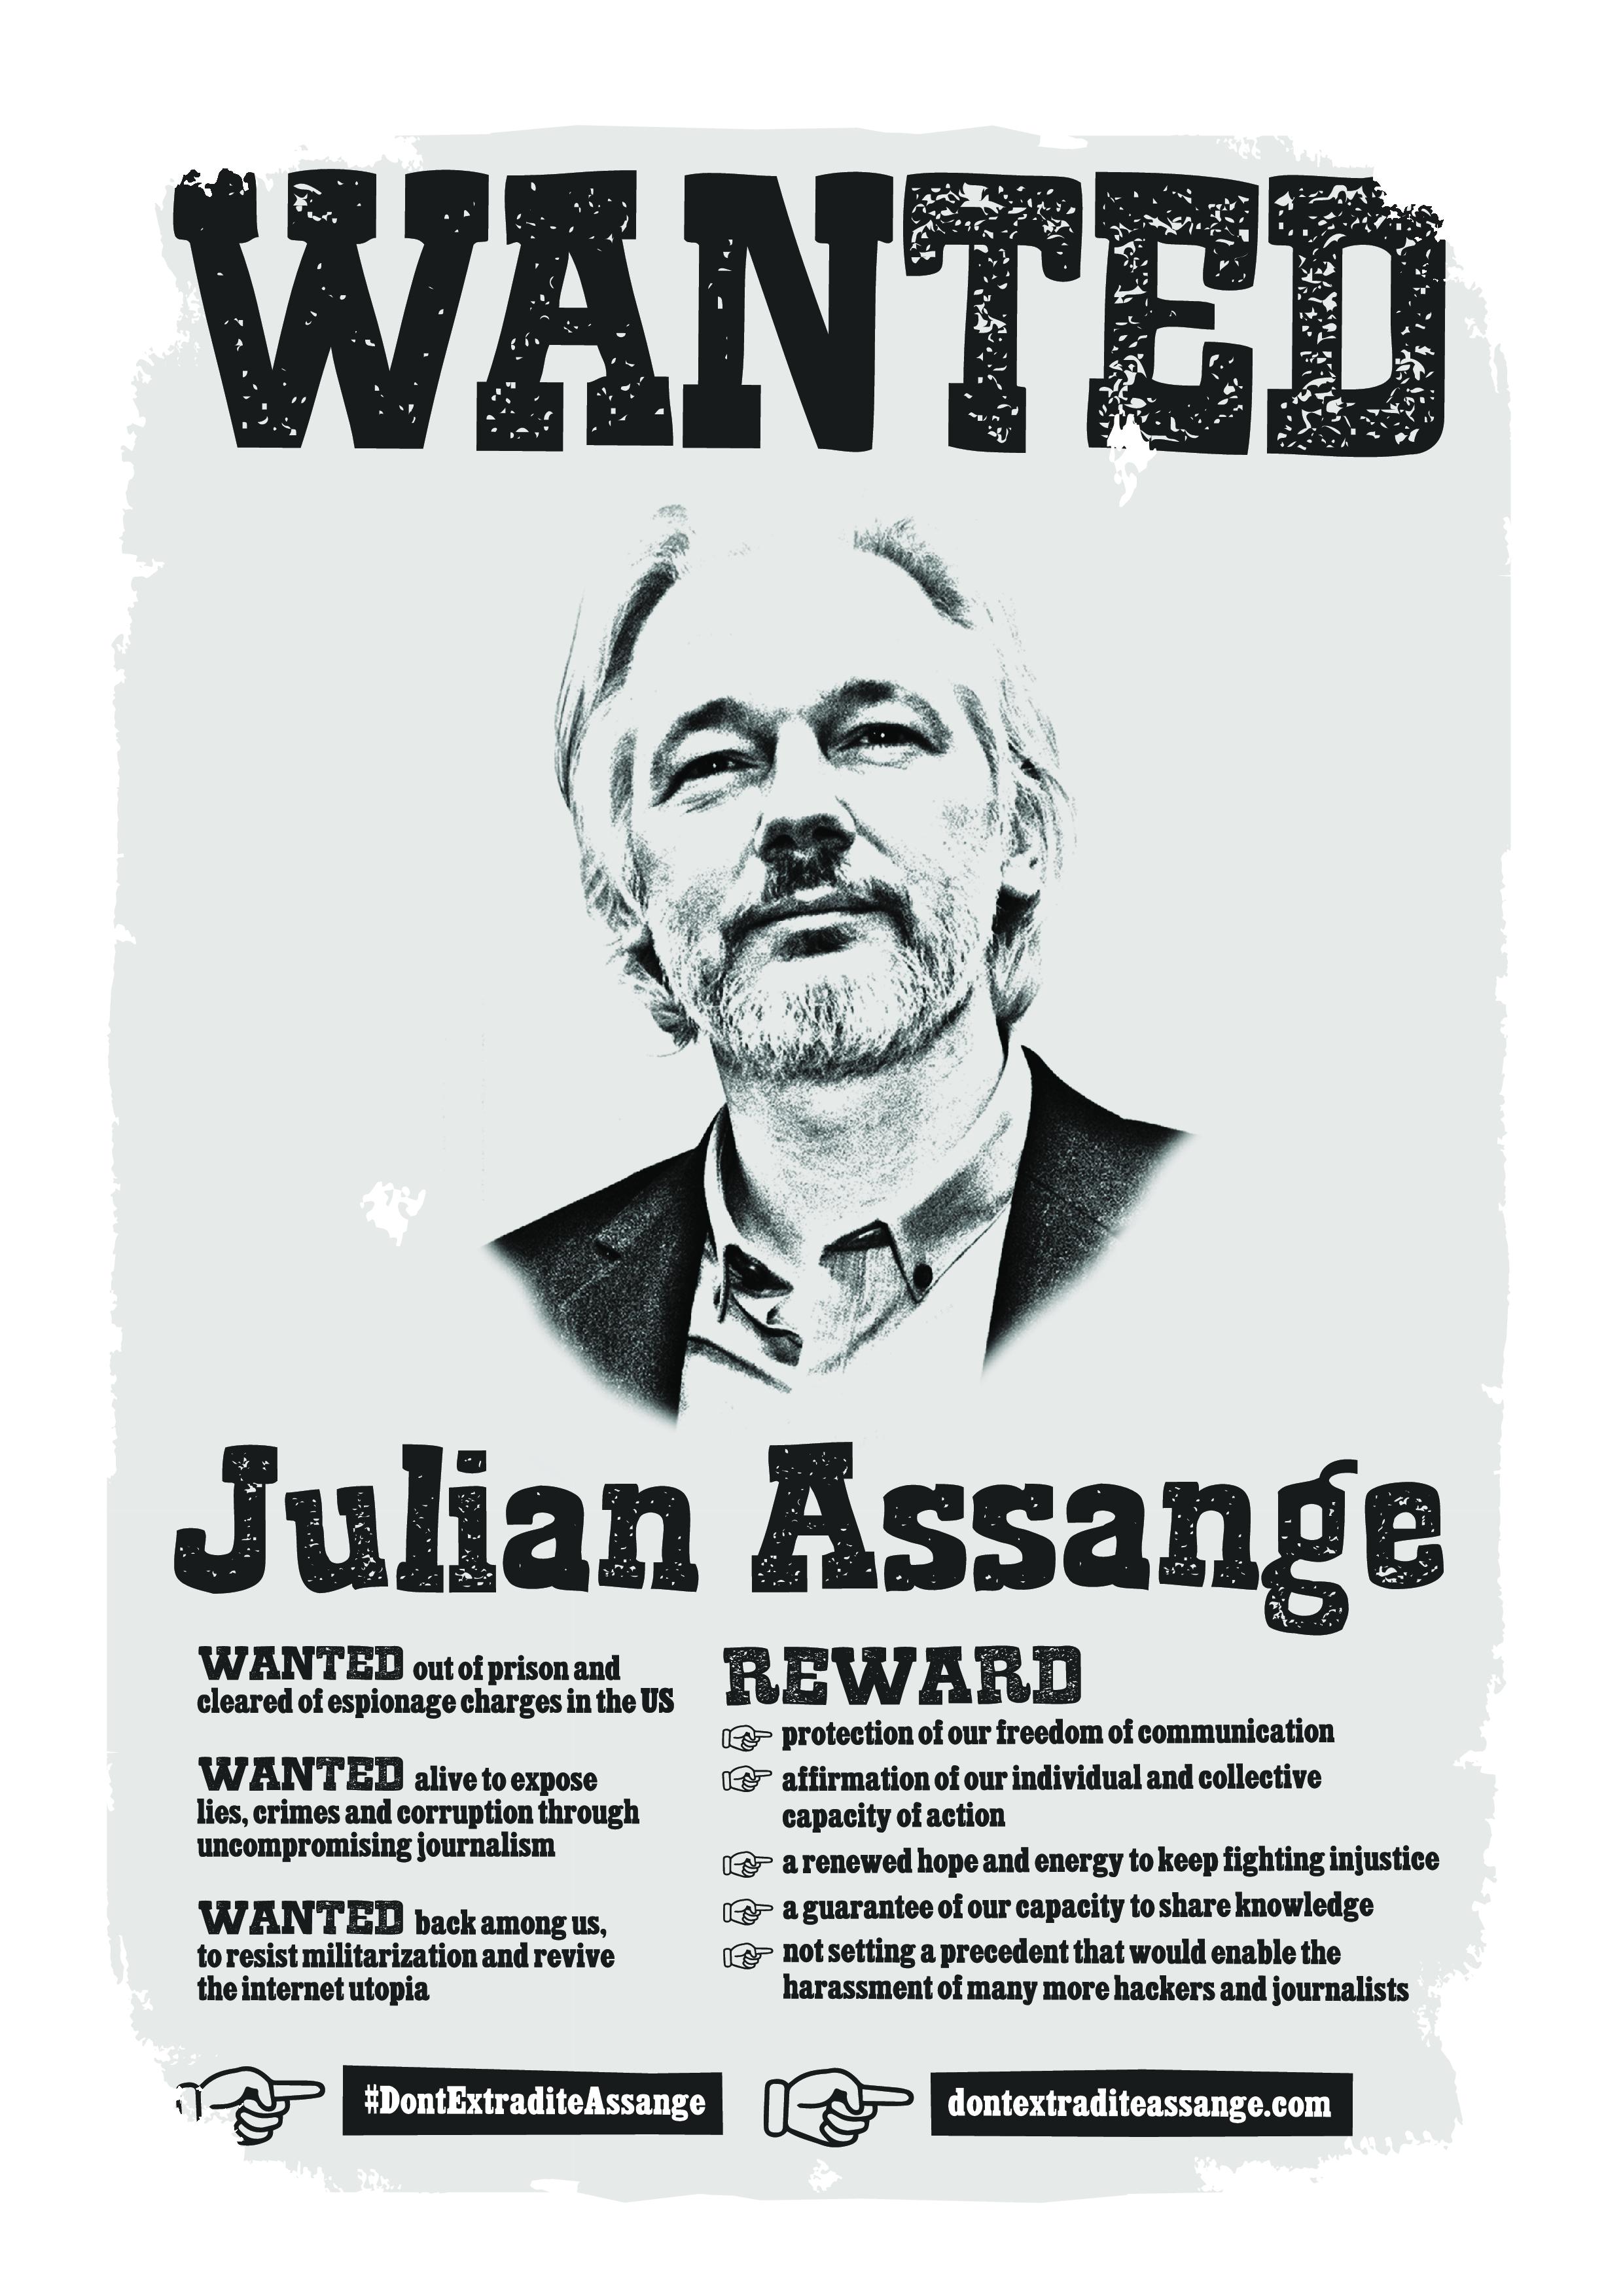 assange-wanted-postera4-print.png